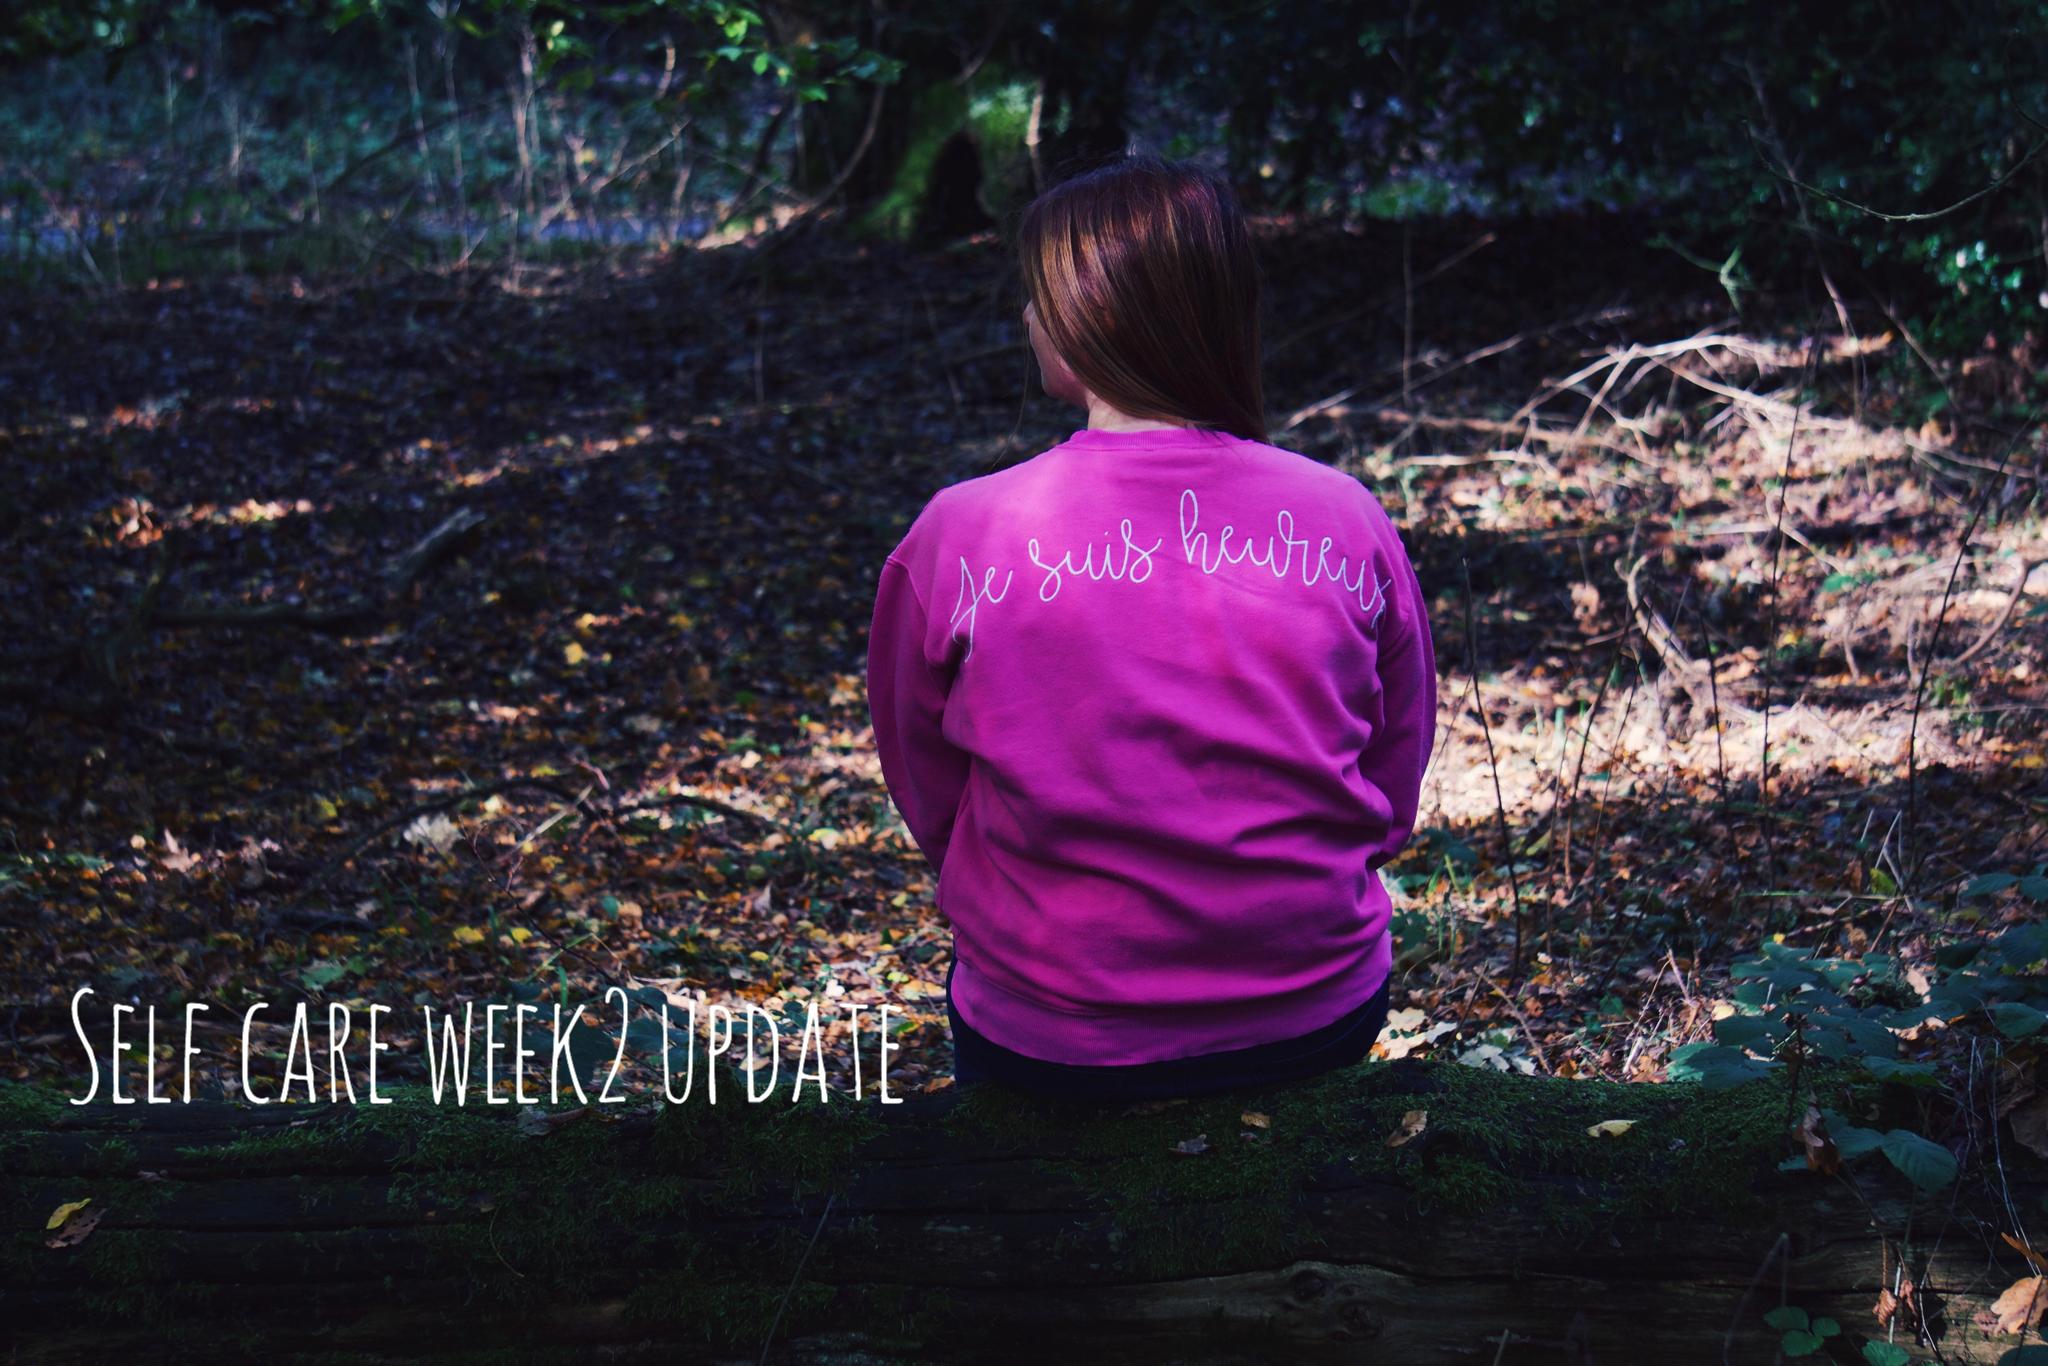 Self Care Week 2 Update graphic